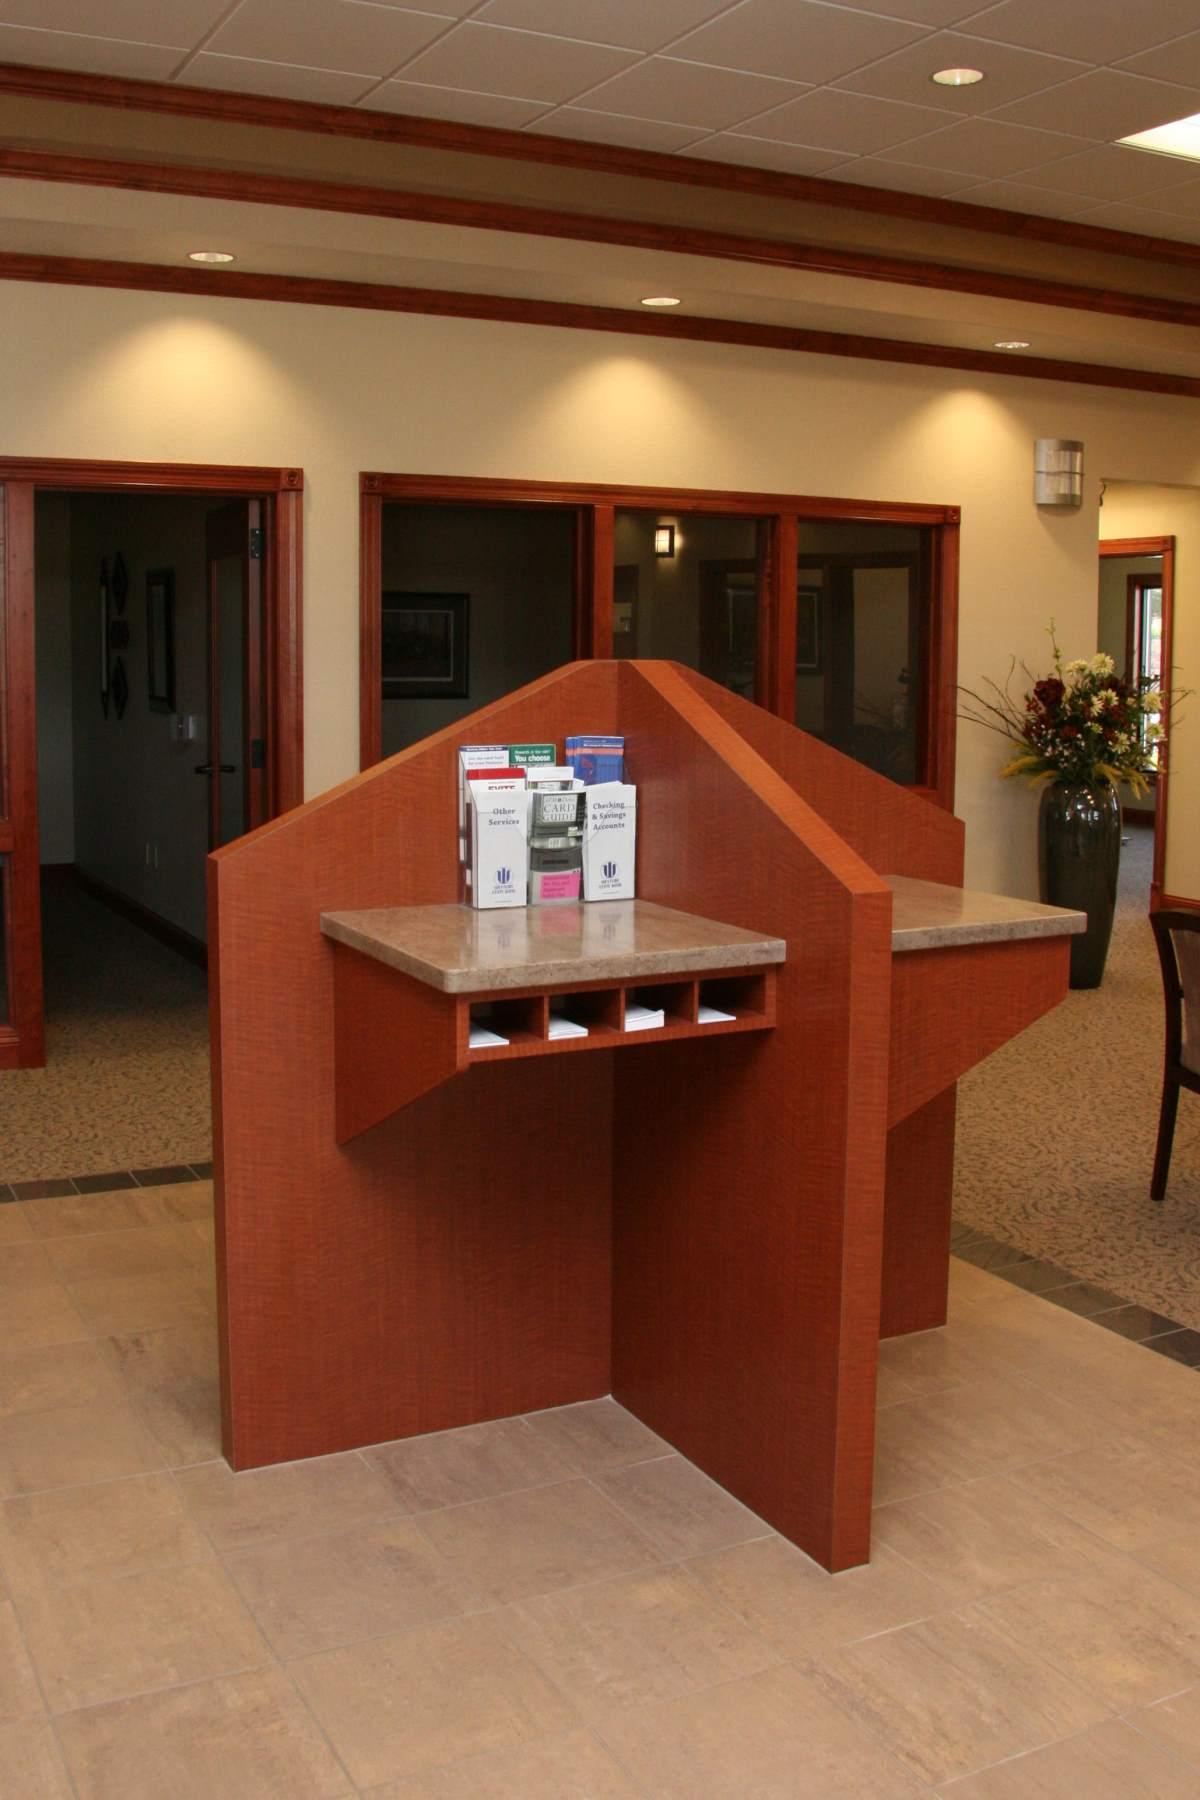 Design bank reception area